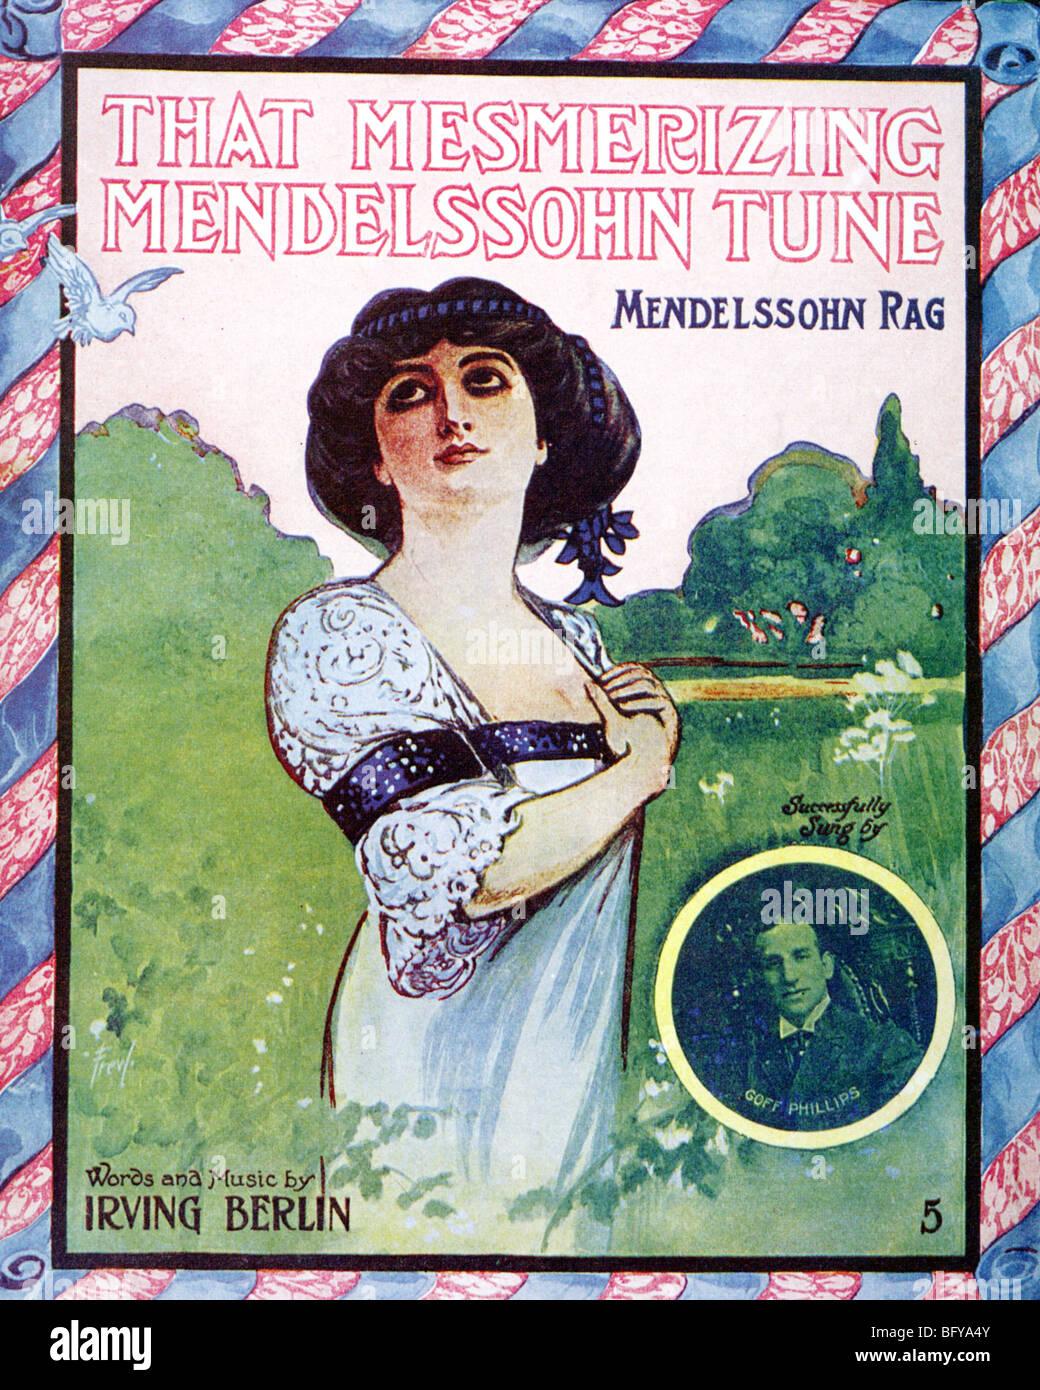 IRVING BERLIN  Sheet music for his 1909 ragtime composition That Mesmerizing Mendelssohn Tune - Stock Image